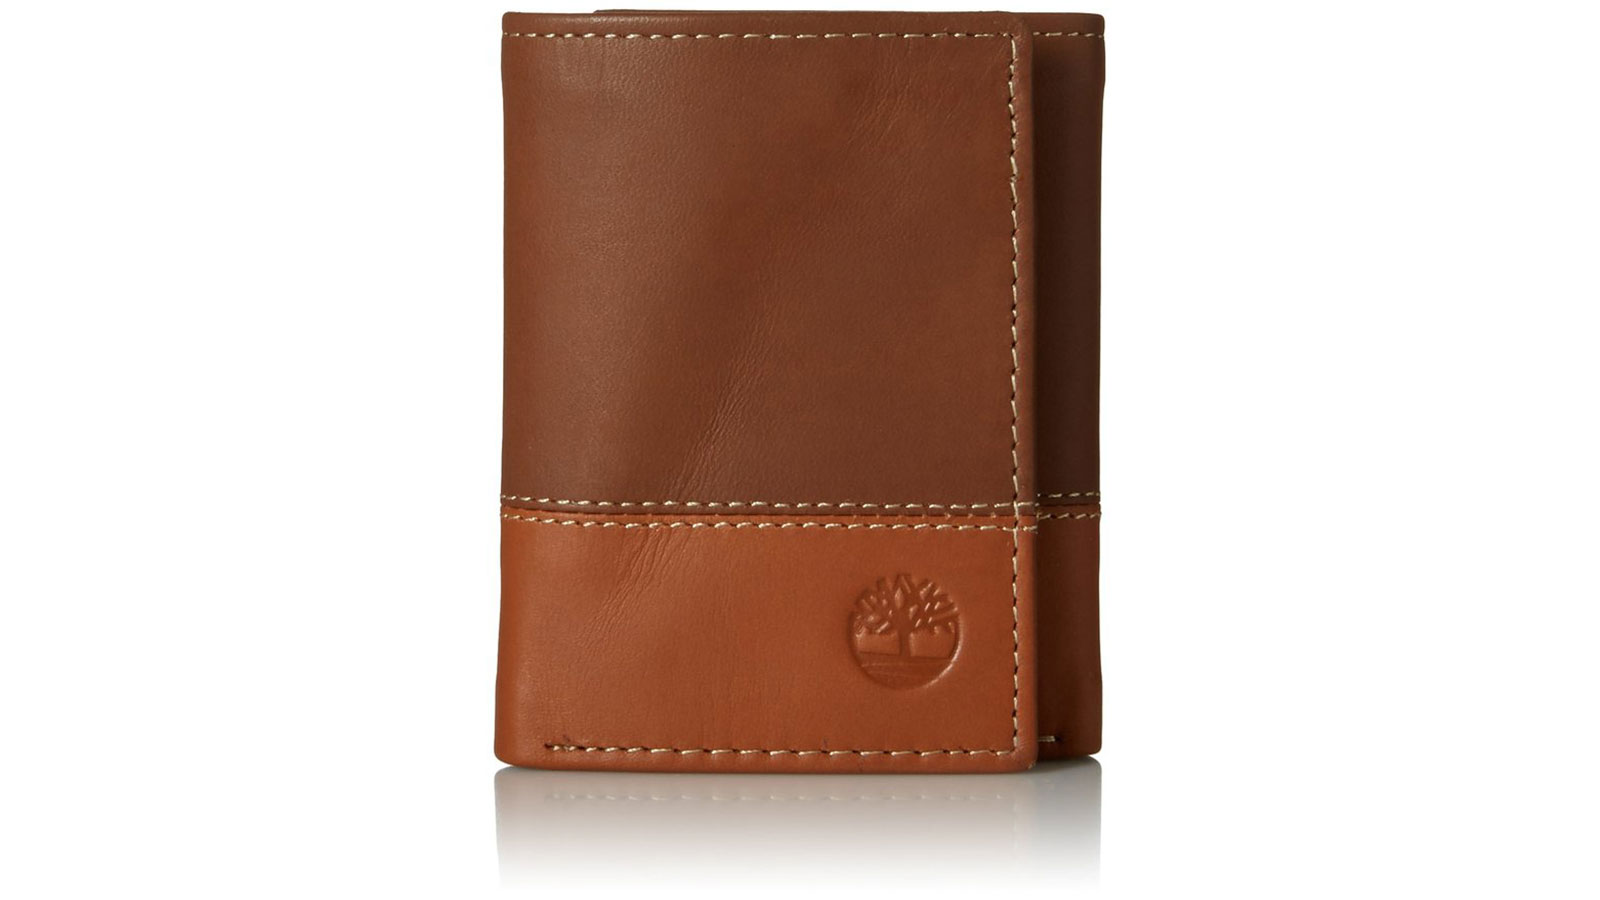 Timberland Men's Hunter Trifold Wallet | best mens trifold wallets